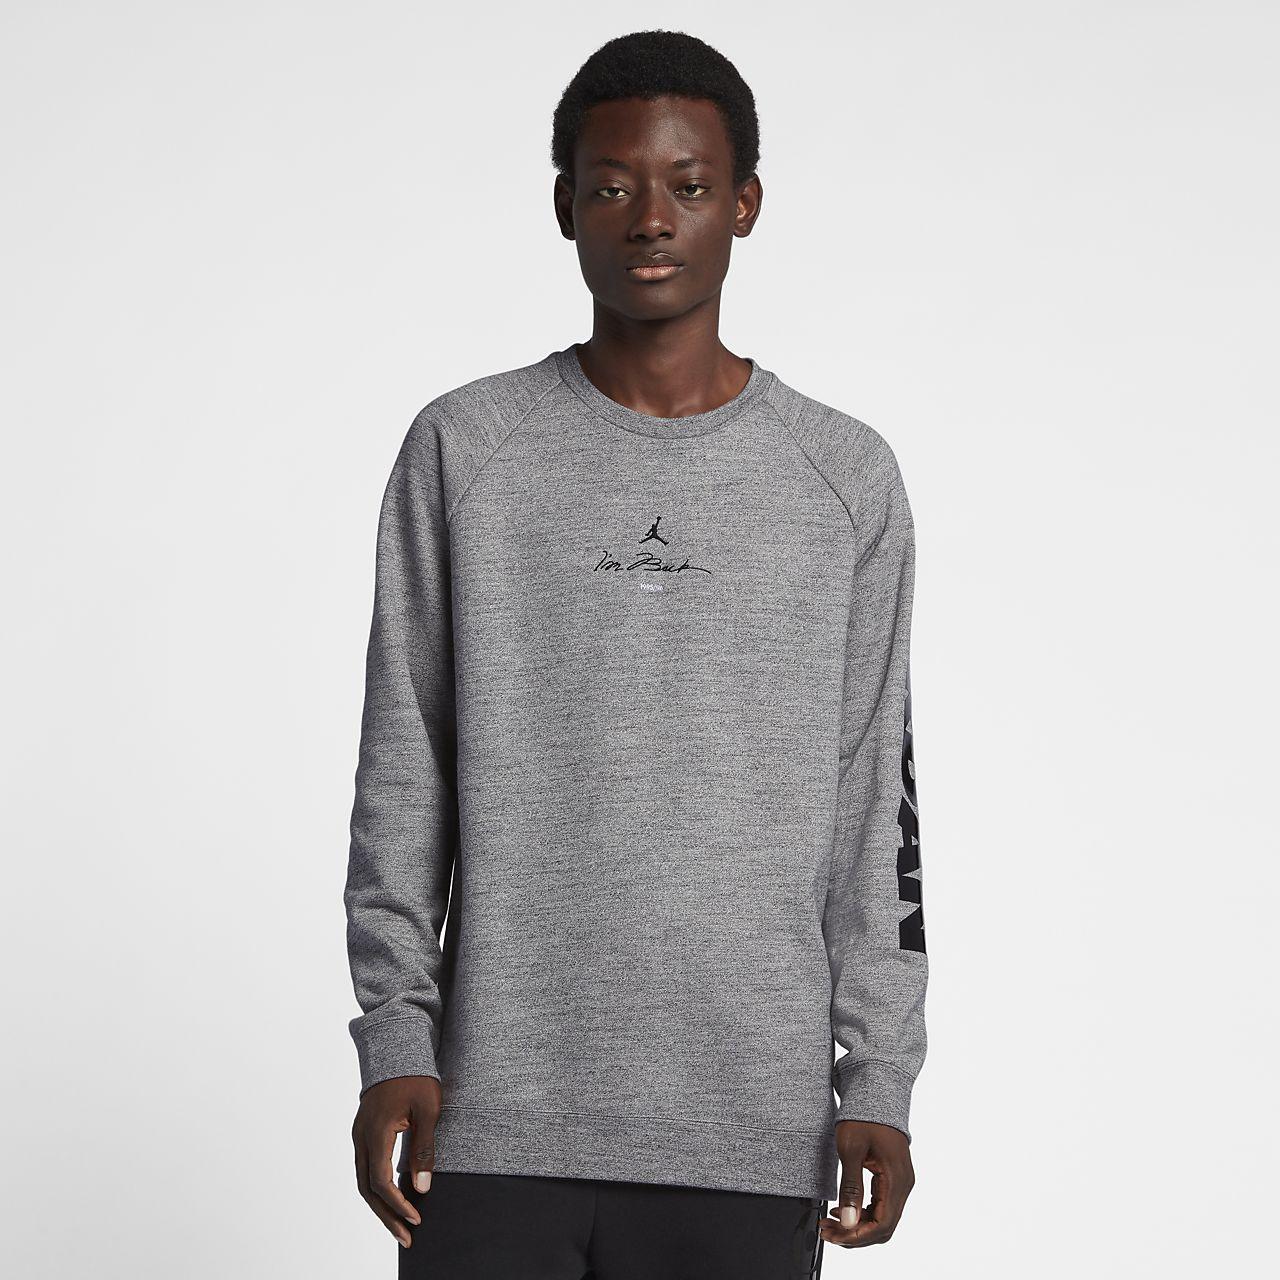 Sportswear Nike De Hombre Vellón Jordan 11 Sudadera Aj Legacy Para tqXRxdqwz